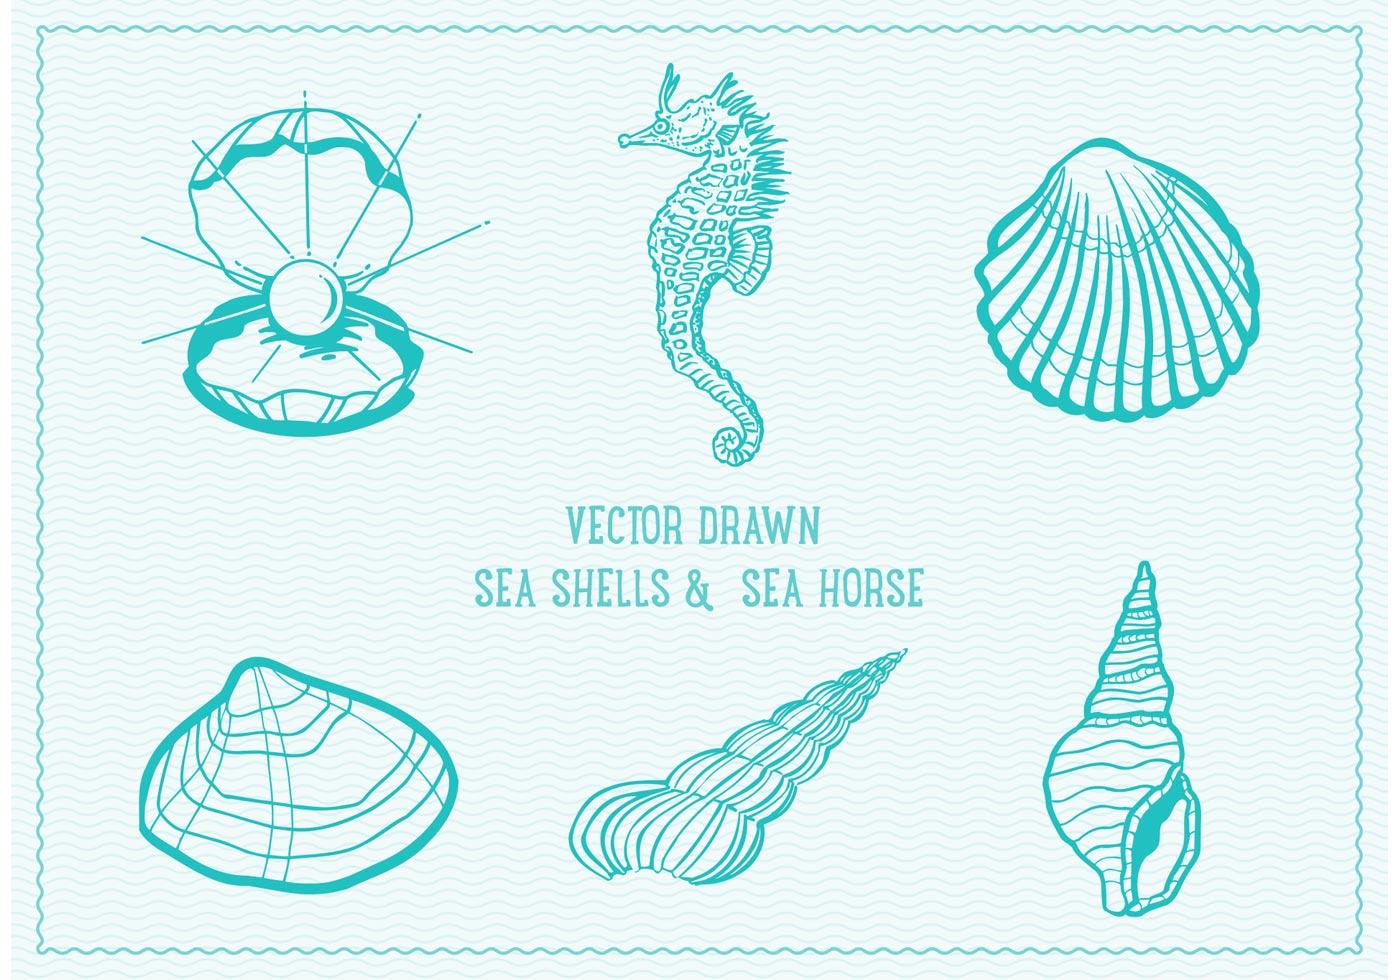 1400x980 Czeshop Images Seashell Vector Free Download